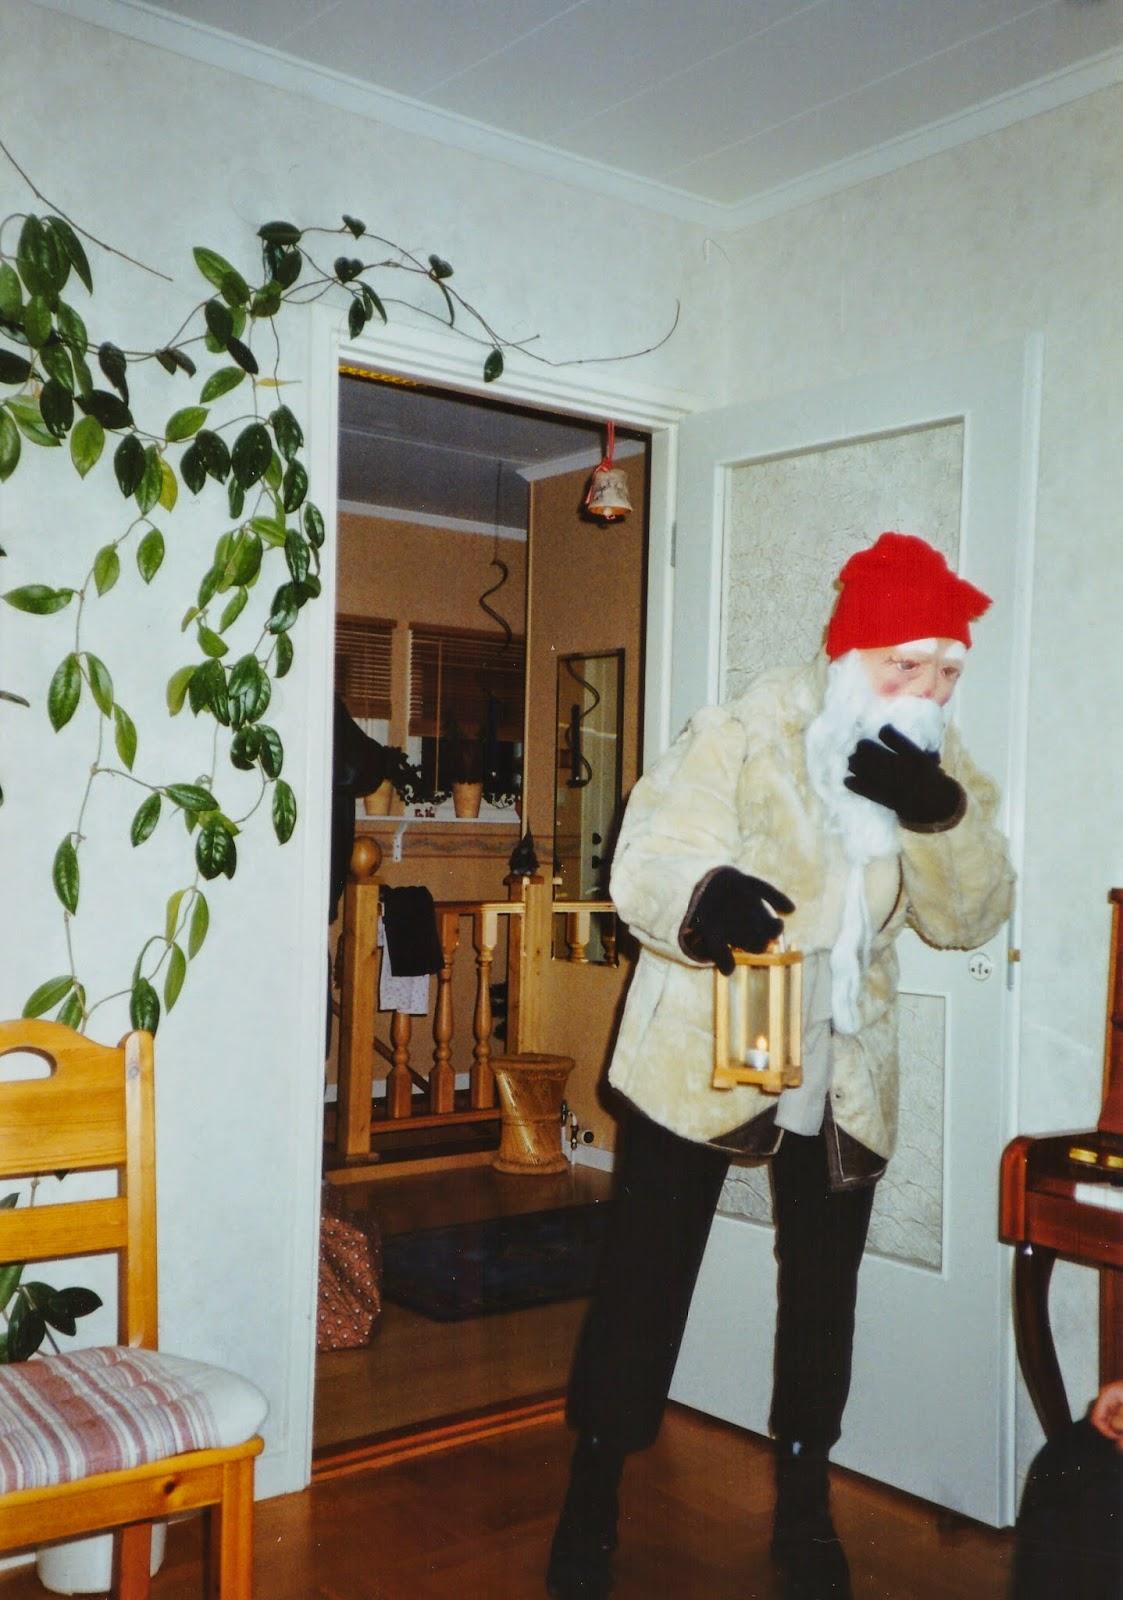 Agent nygrens blogg!: augusti 2014